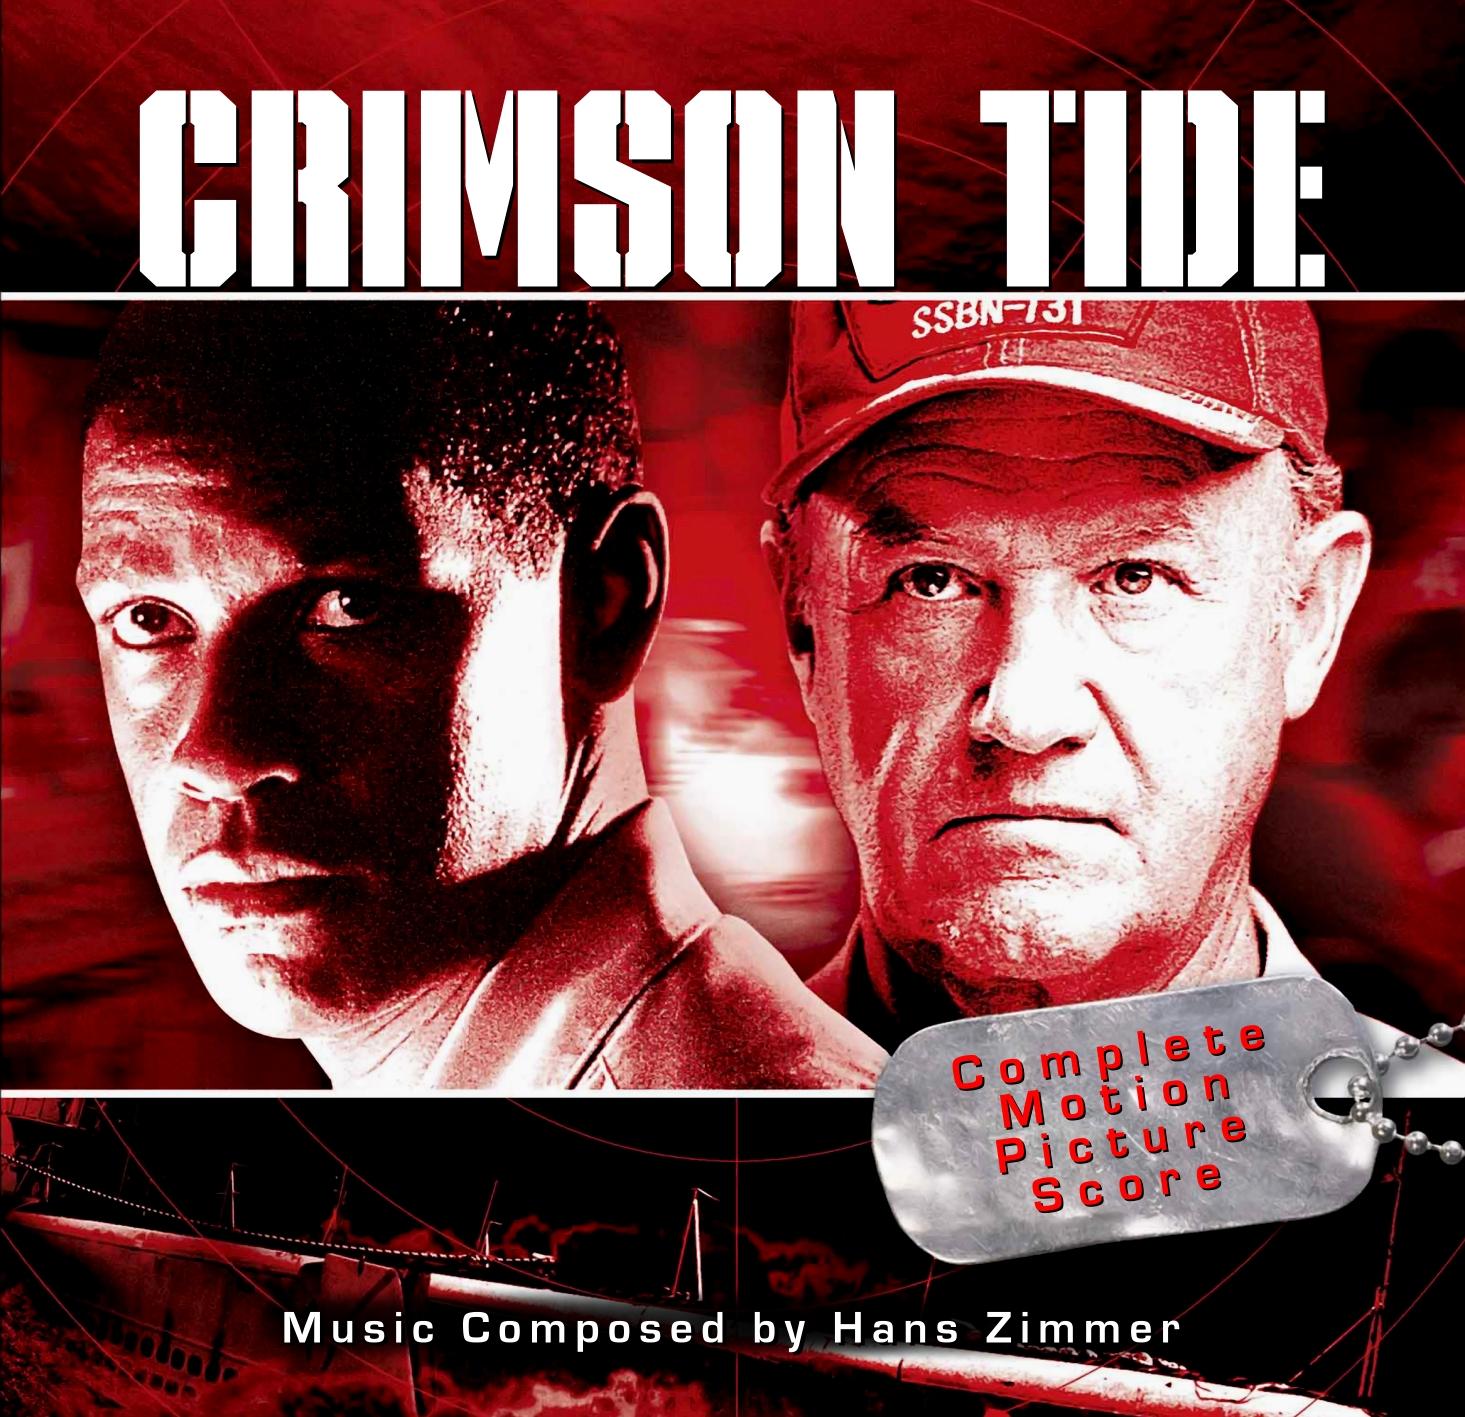 crimson tide Find album reviews, stream songs, credits and award information for crimson tide [original motion picture soundtrack] - hans zimmer on allmusic - 1995 - for better or for worse, hans zimmer's crimson&hellip.